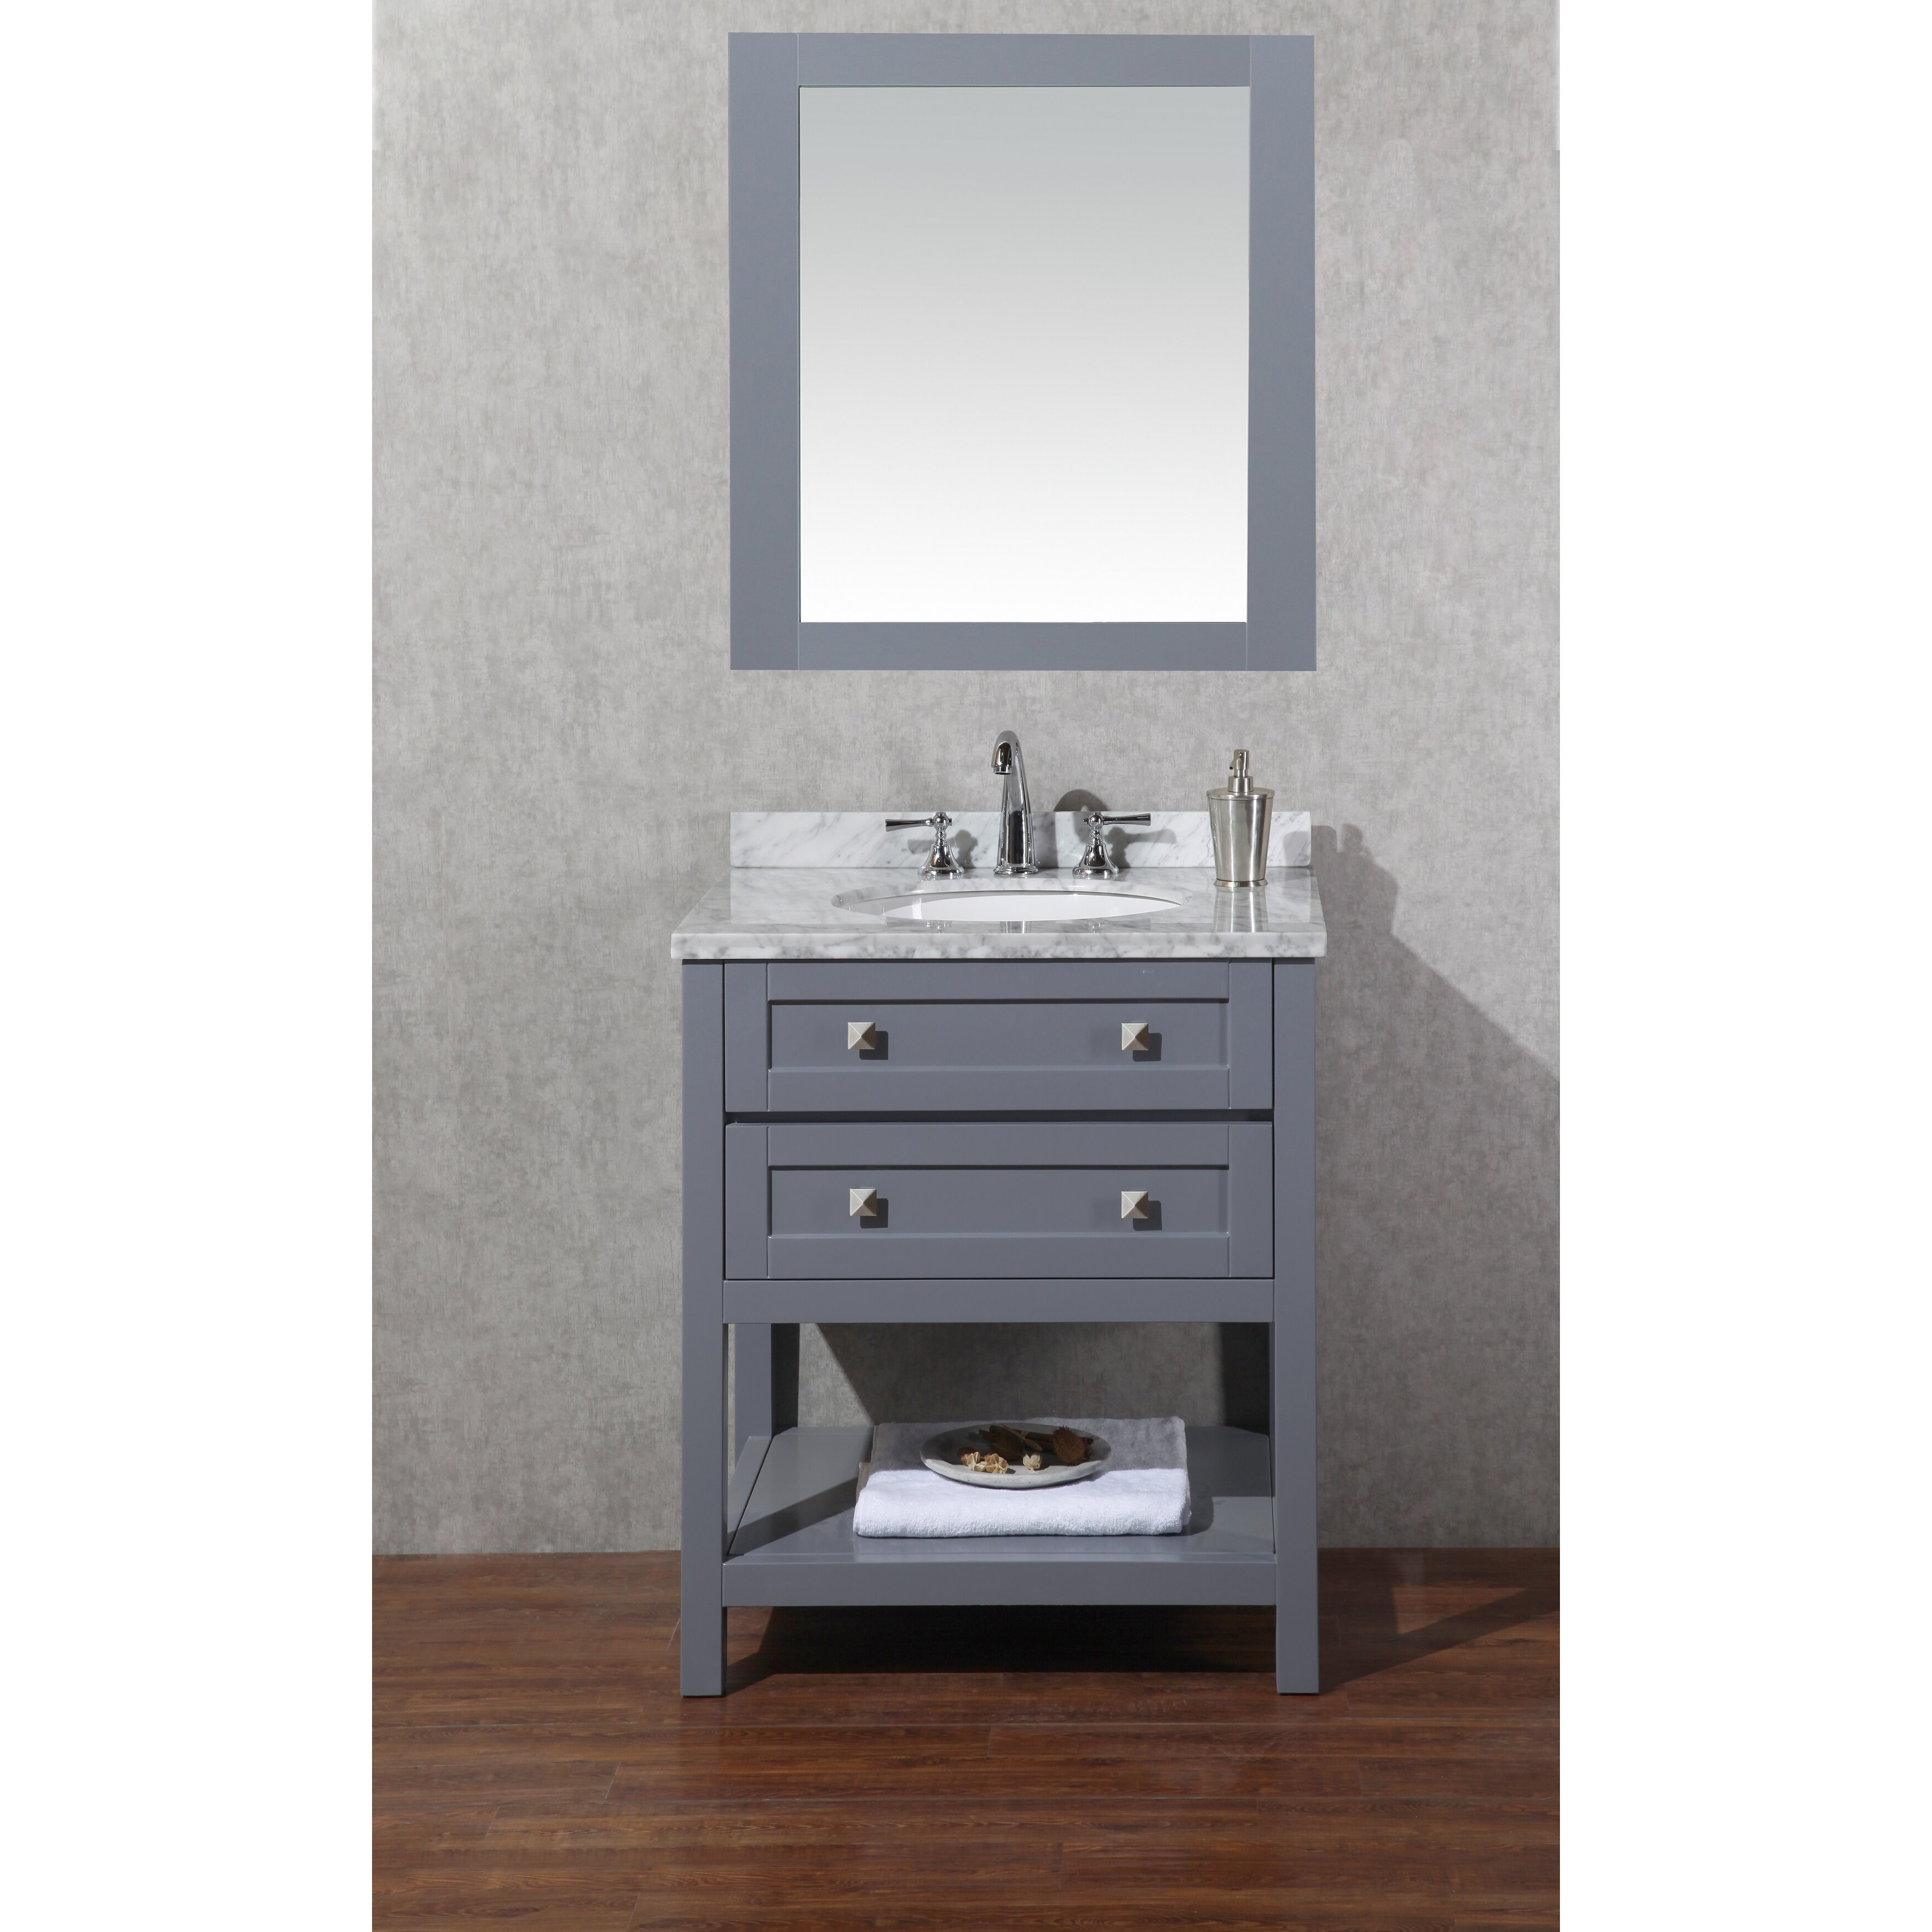 Dcor design albia 30 single modern bathroom vanity set for Mirrored bathroom set